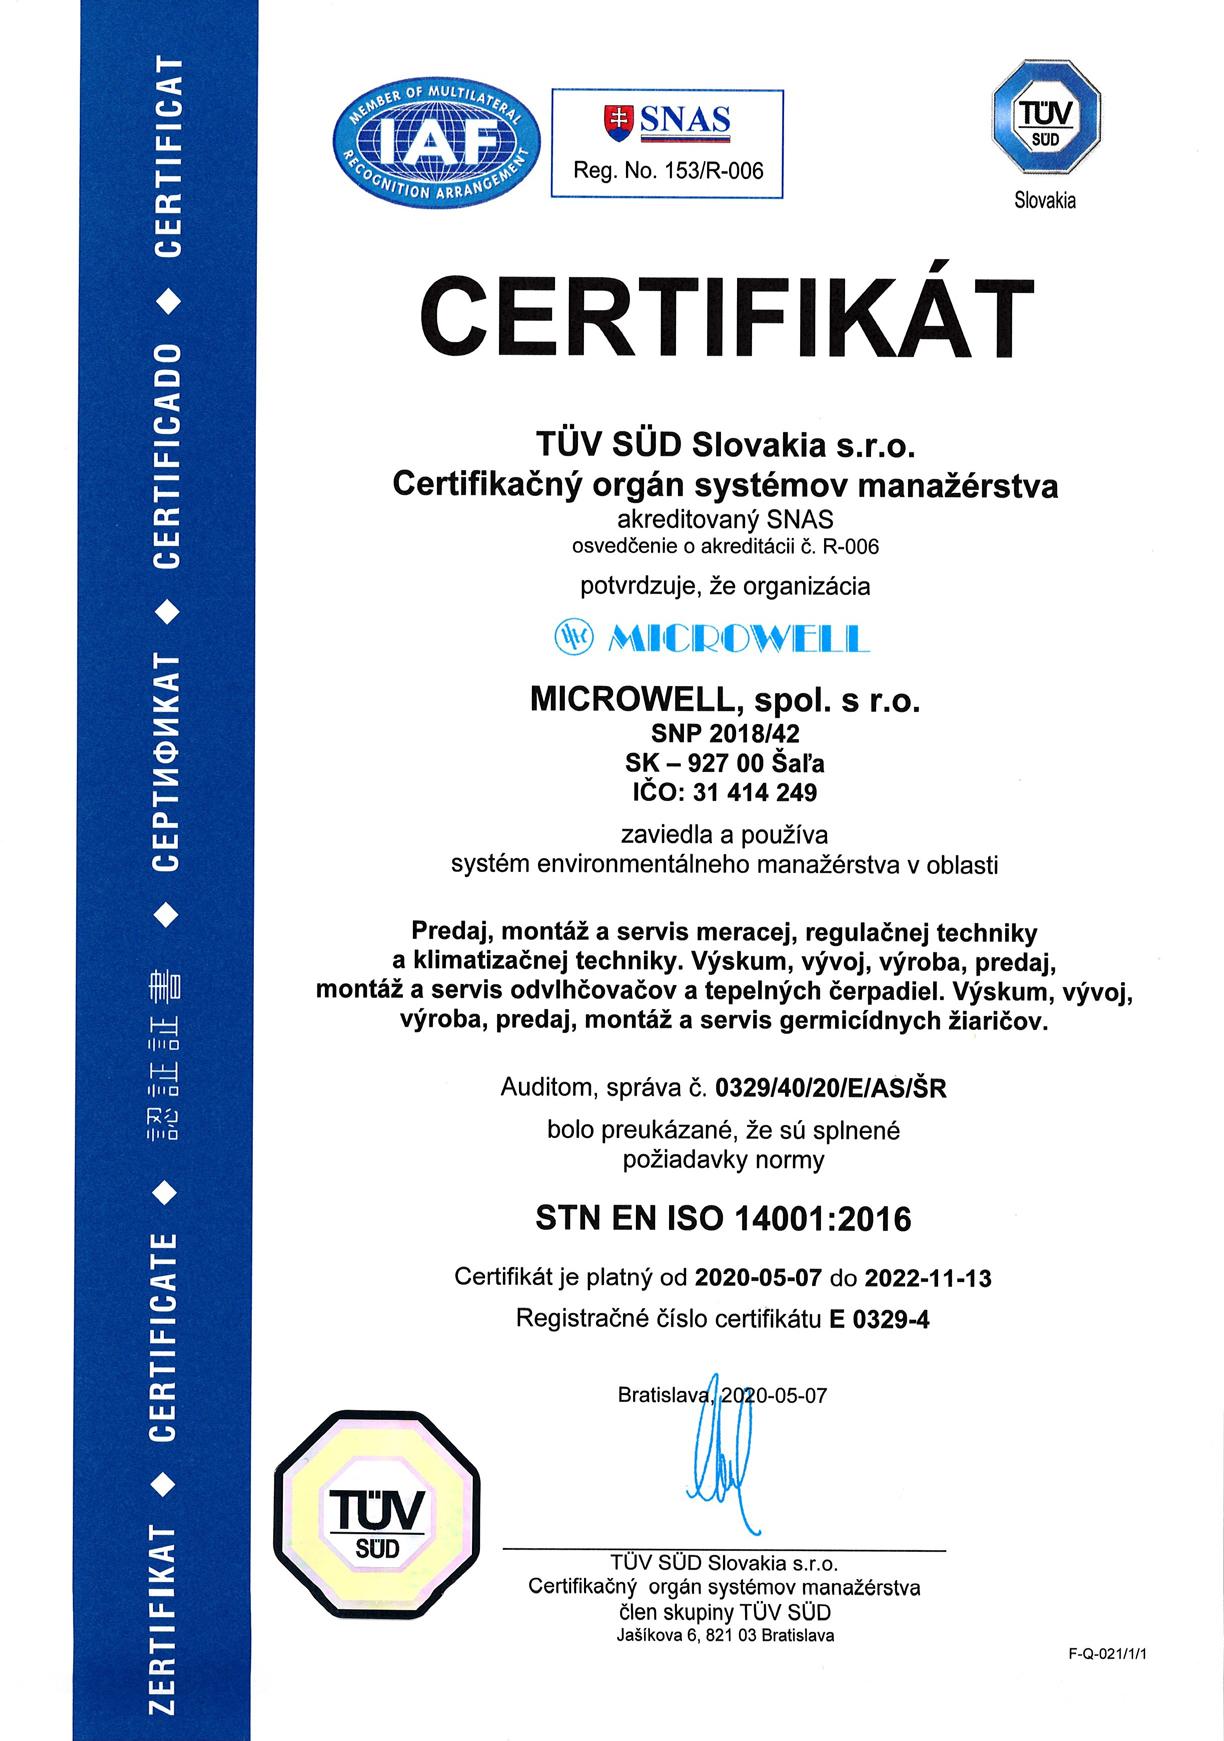 Sk ISO 14001 2020 2022